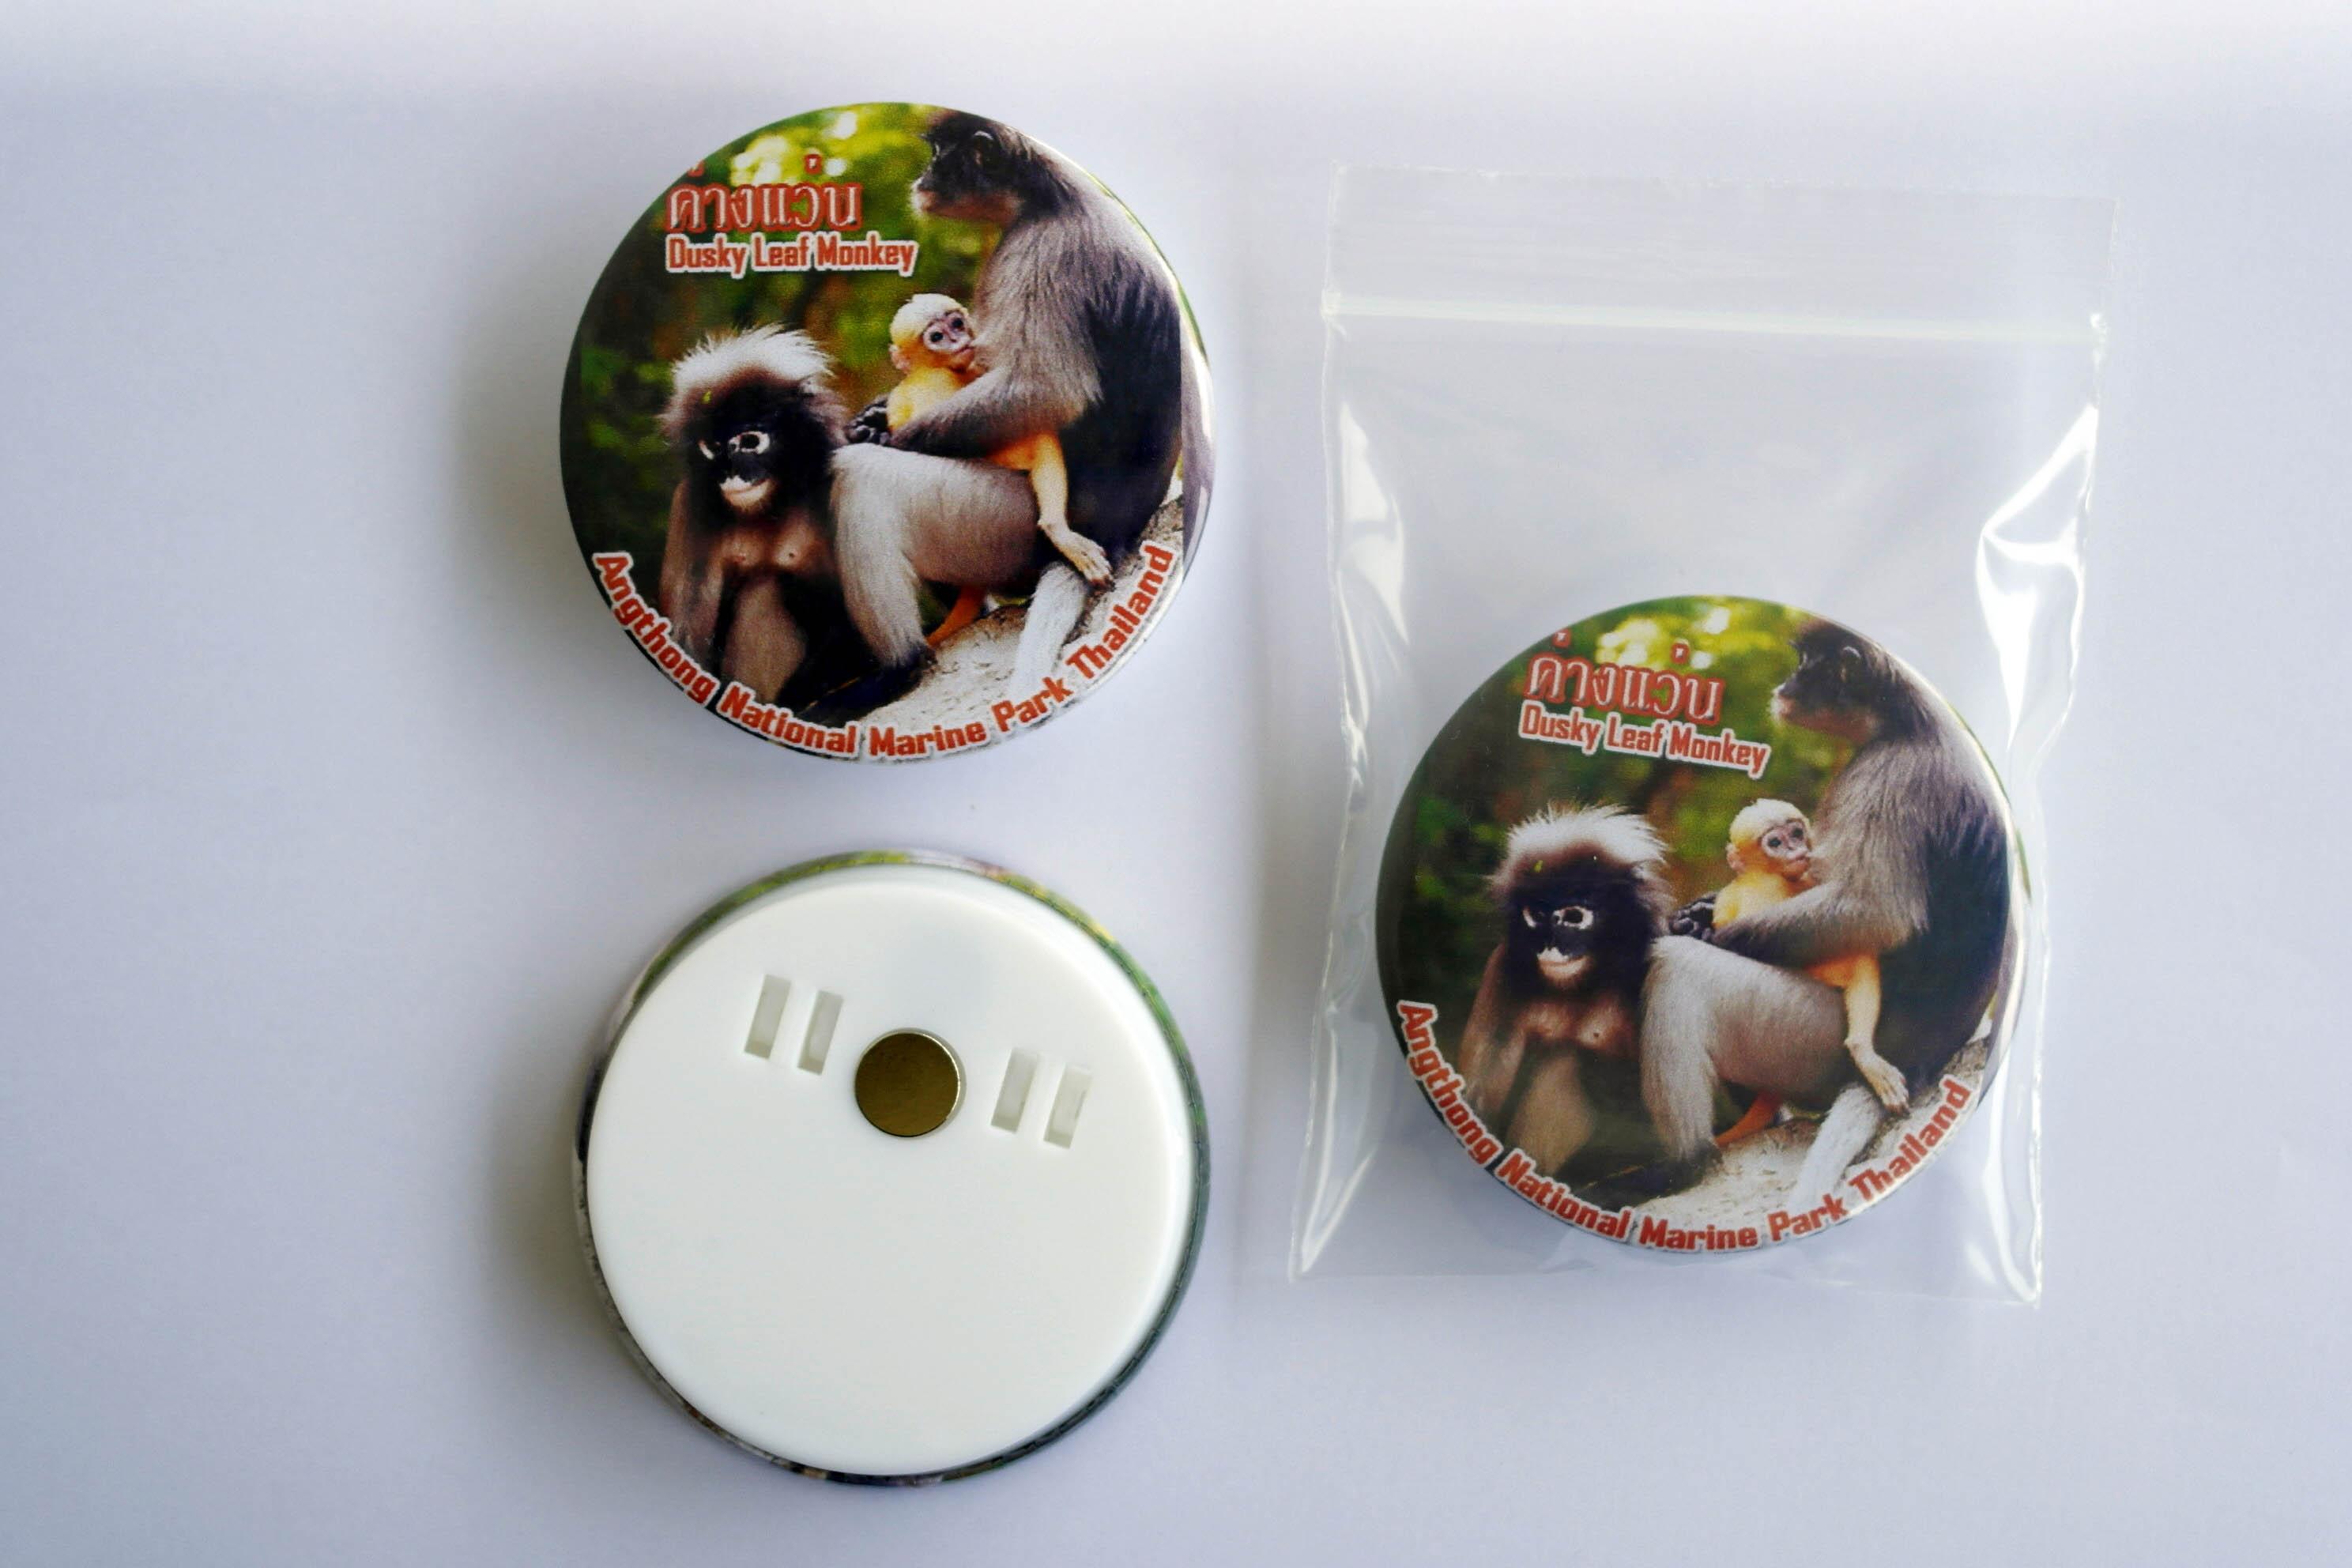 Angthong National Marine Park (Kang Waen : Dusky Leaf Monkey) 58 mm Fridge Magnet with paper clip